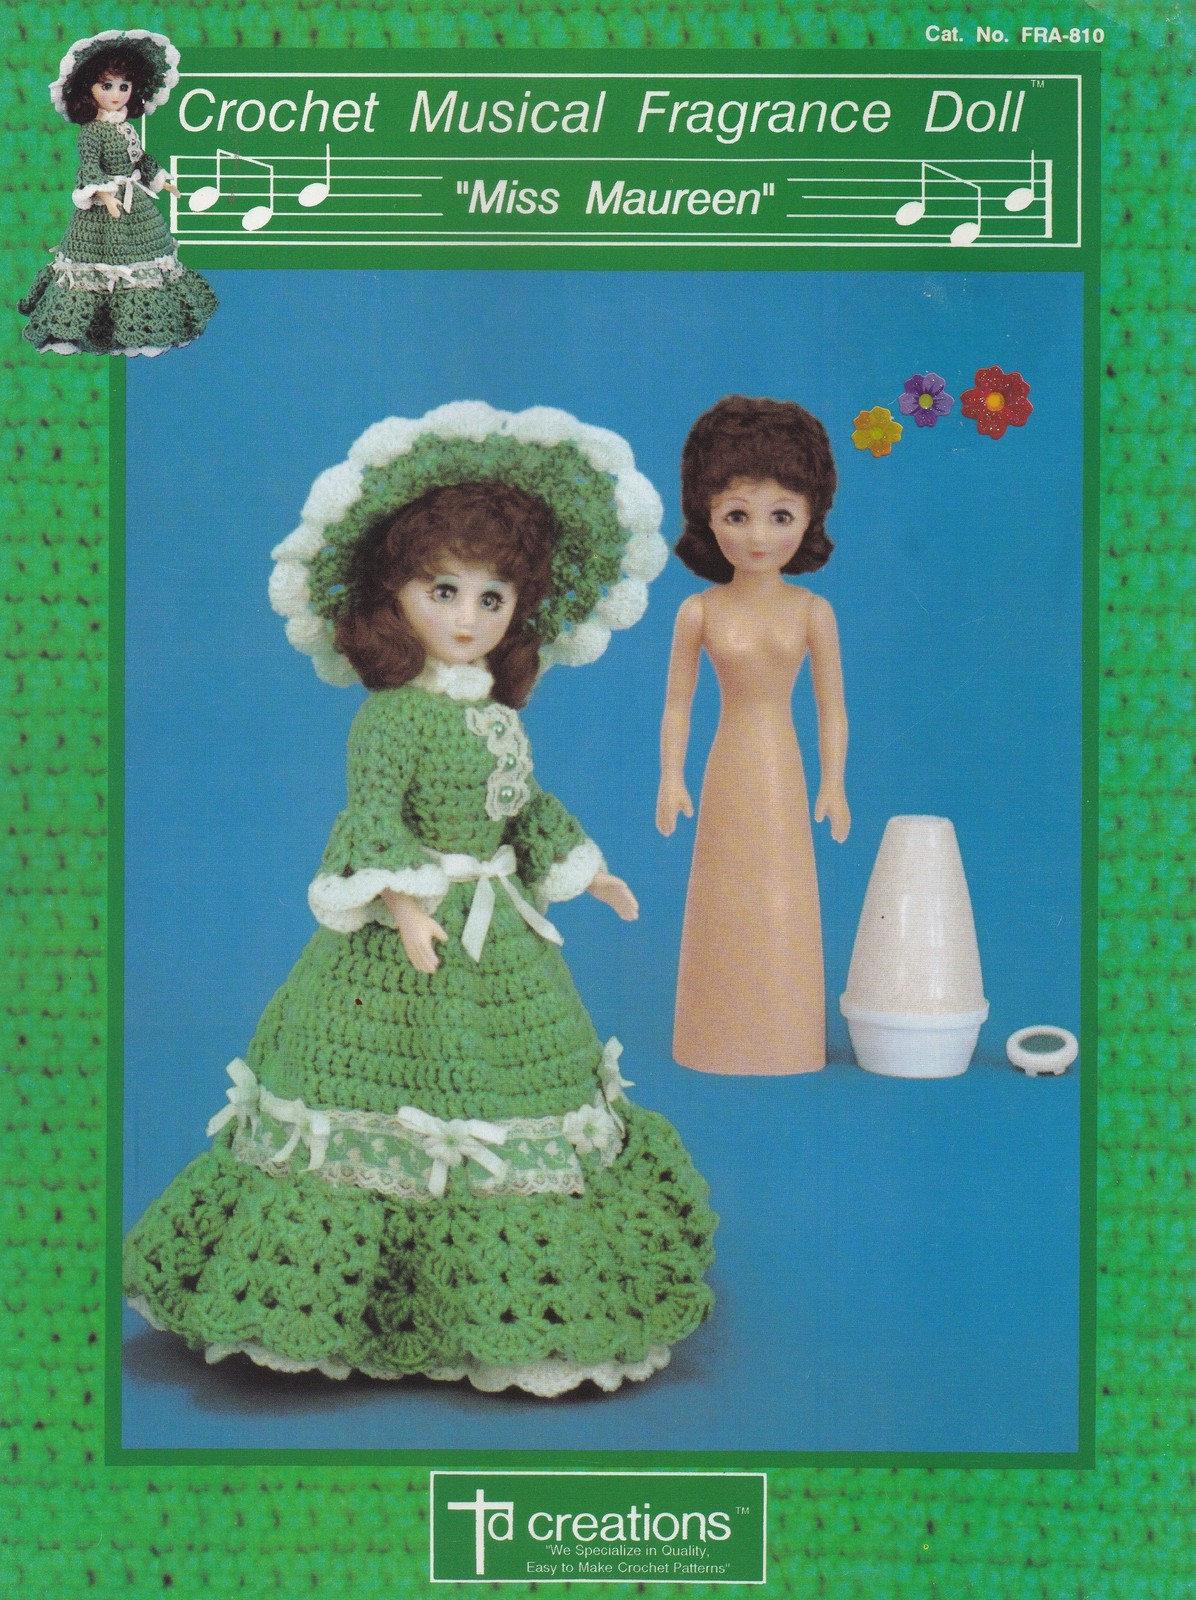 Miss Maureen Td Kreationen häkeln musikalische Duft Puppe